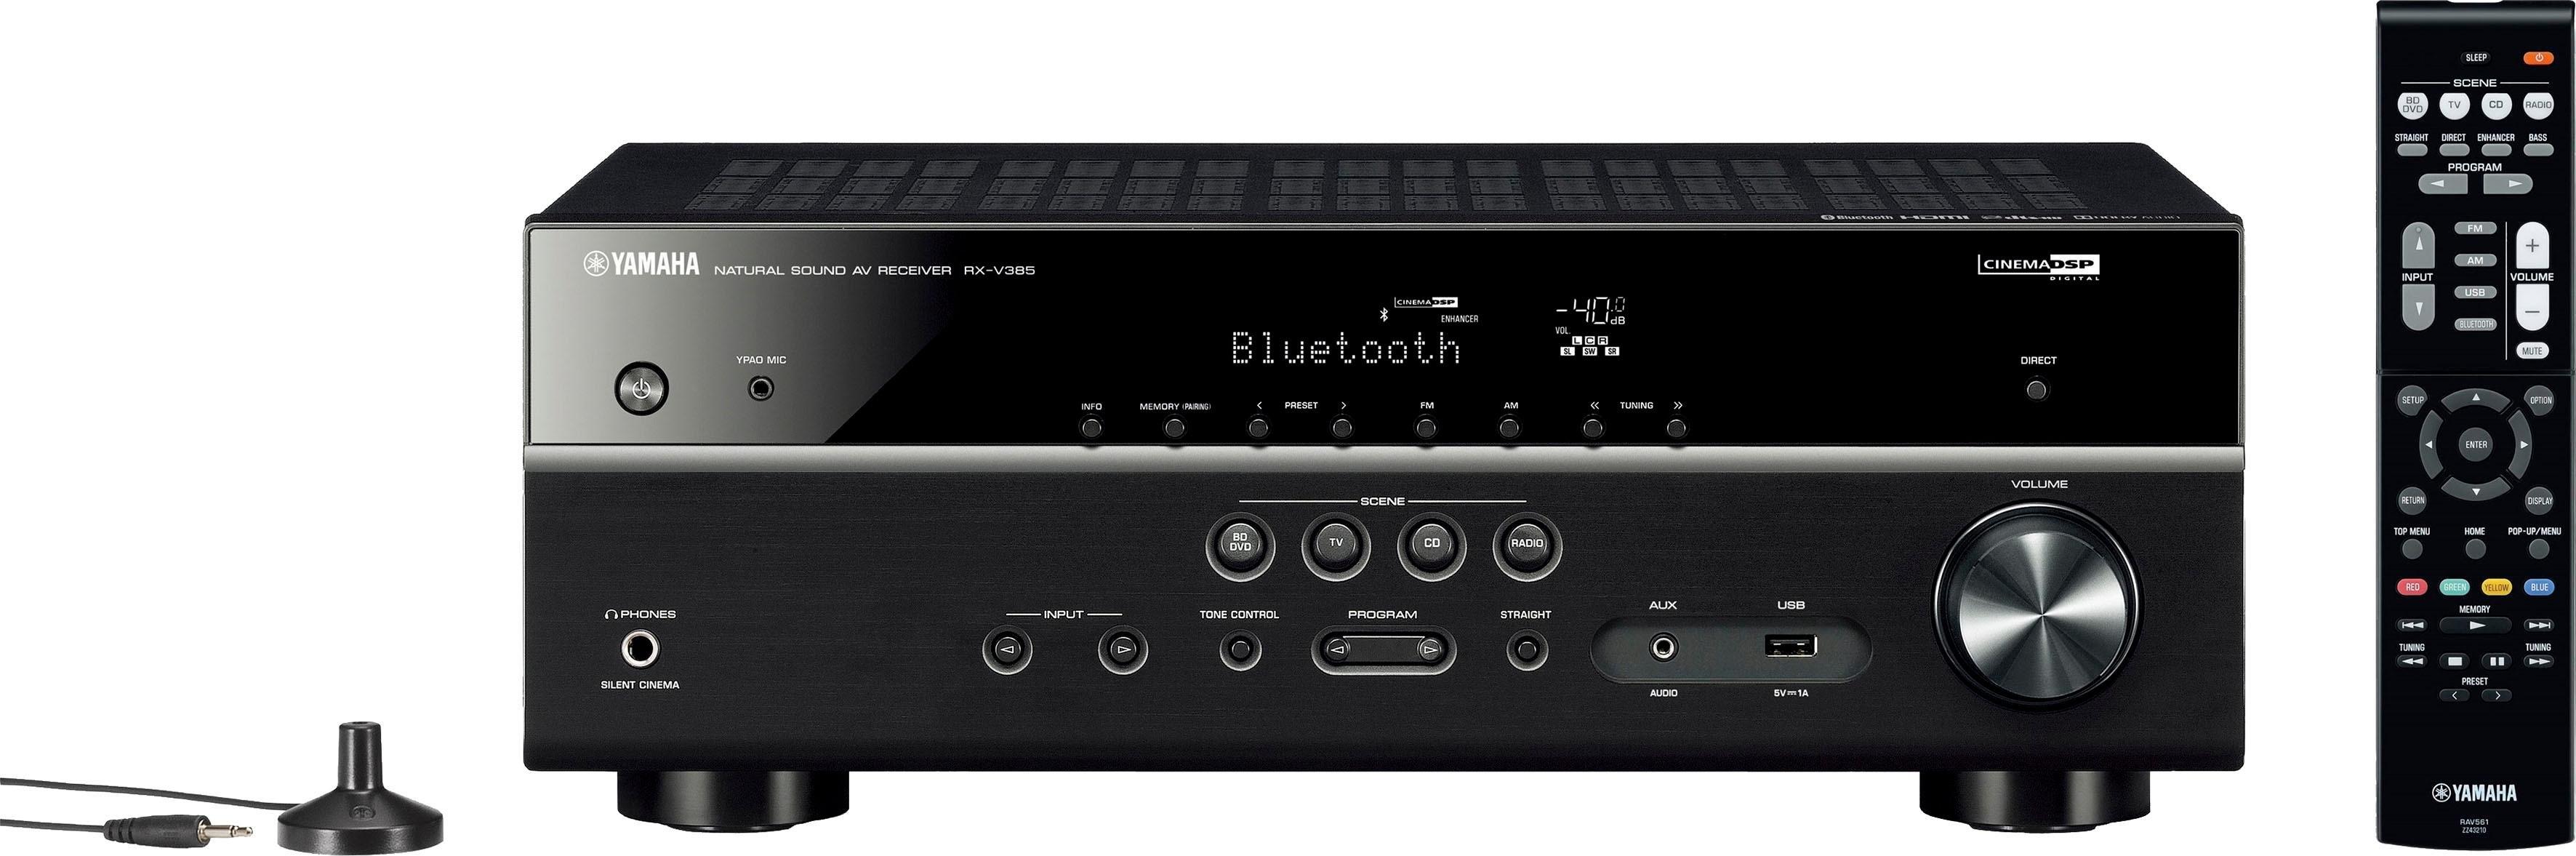 Yamaha »RX-V385« 5.1 AV-receiver (LAN (ethernet), Bluetooth, wifi, 4K-upscalingtechniek) nu online kopen bij OTTO